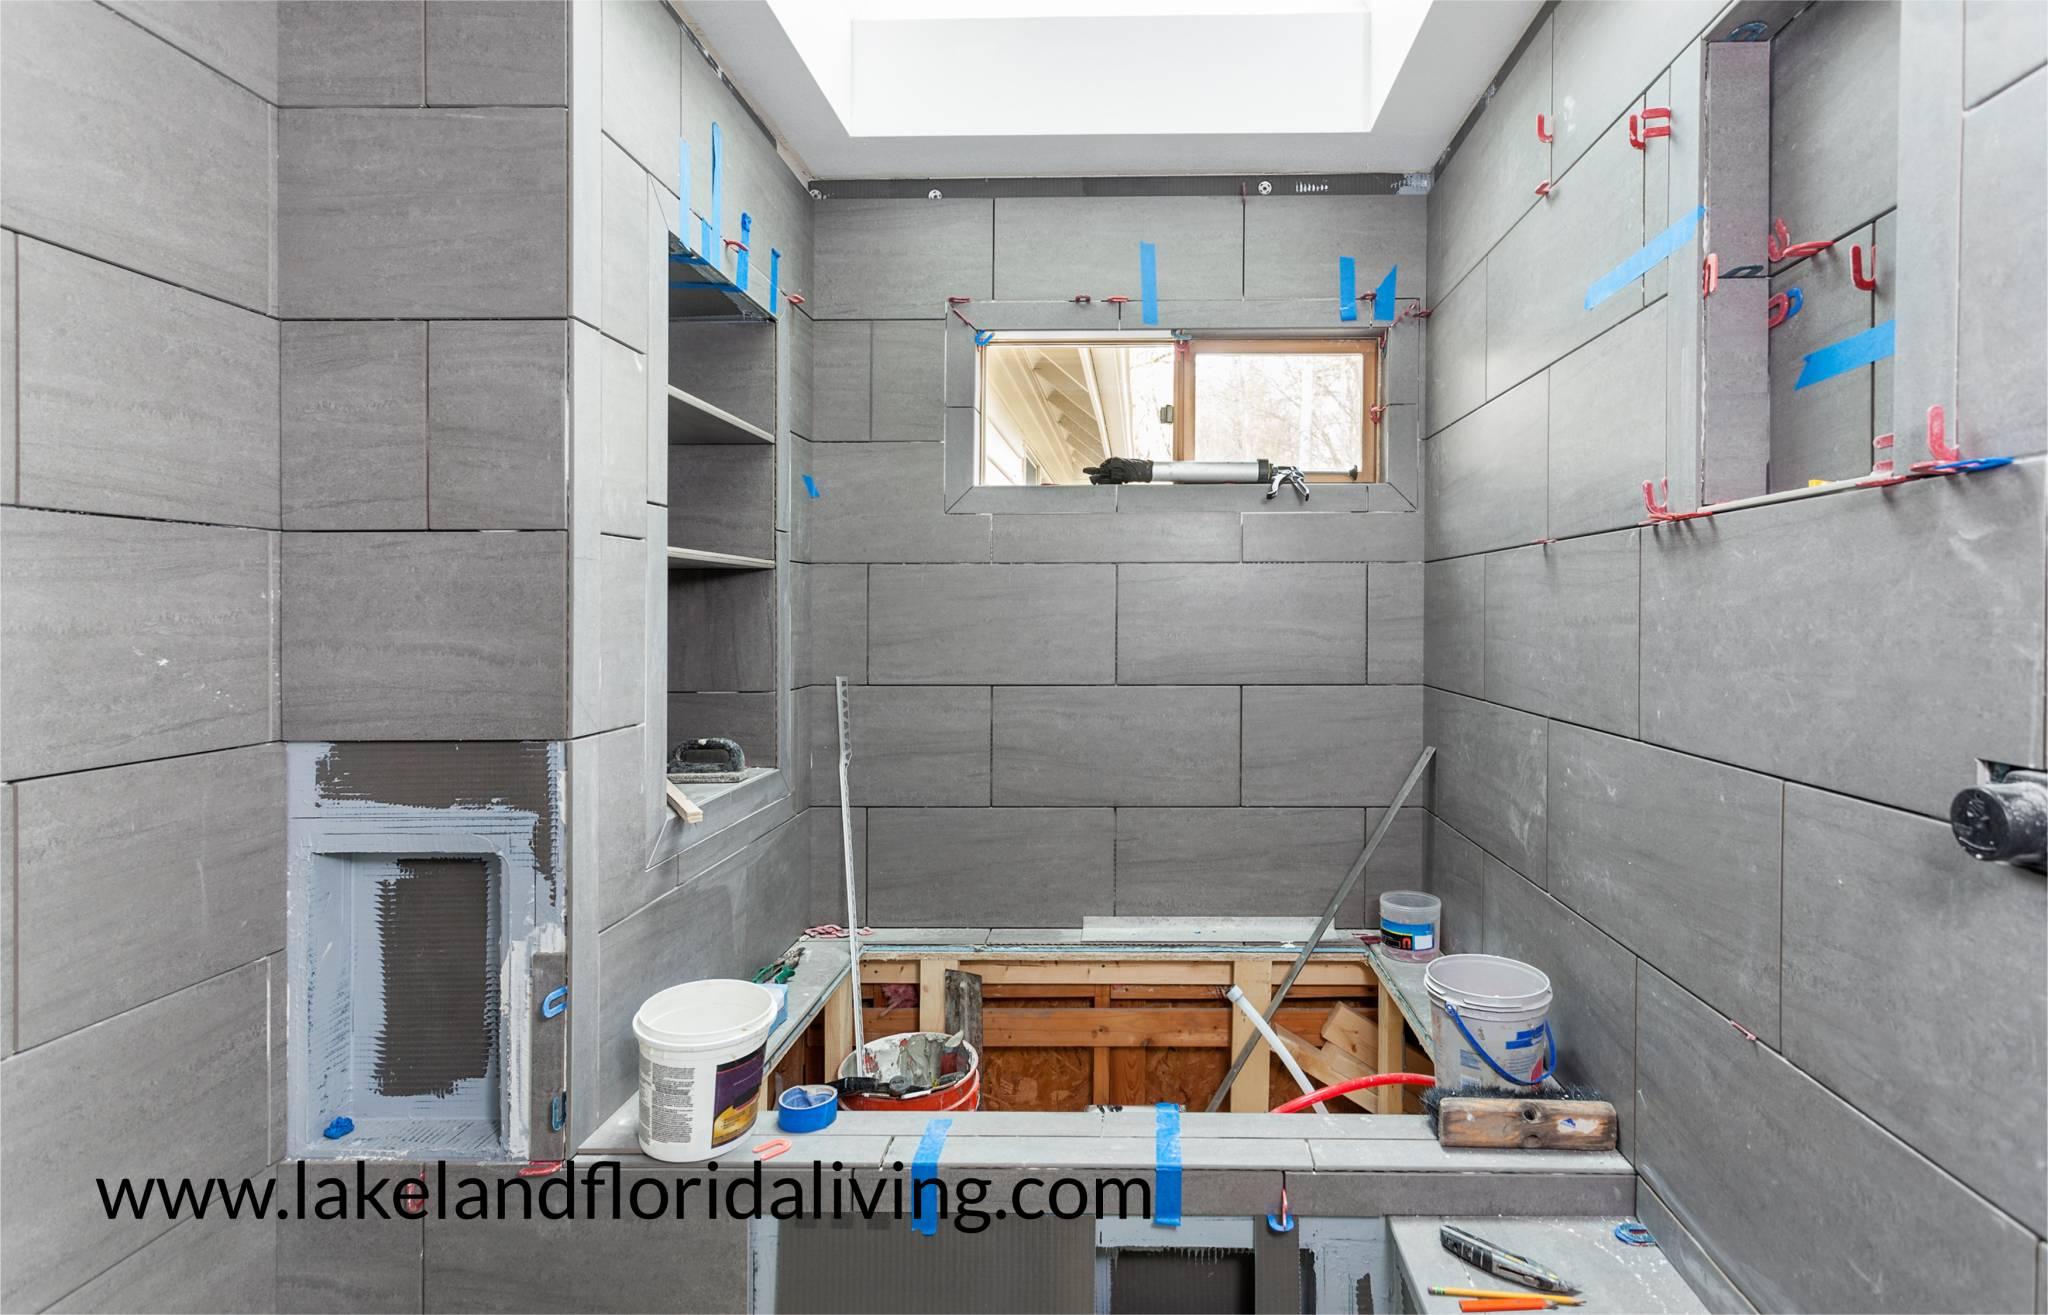 Bathroom Remodeling Trends That Sells Lakeland Real Estate - Bathroom remodel trends 2018